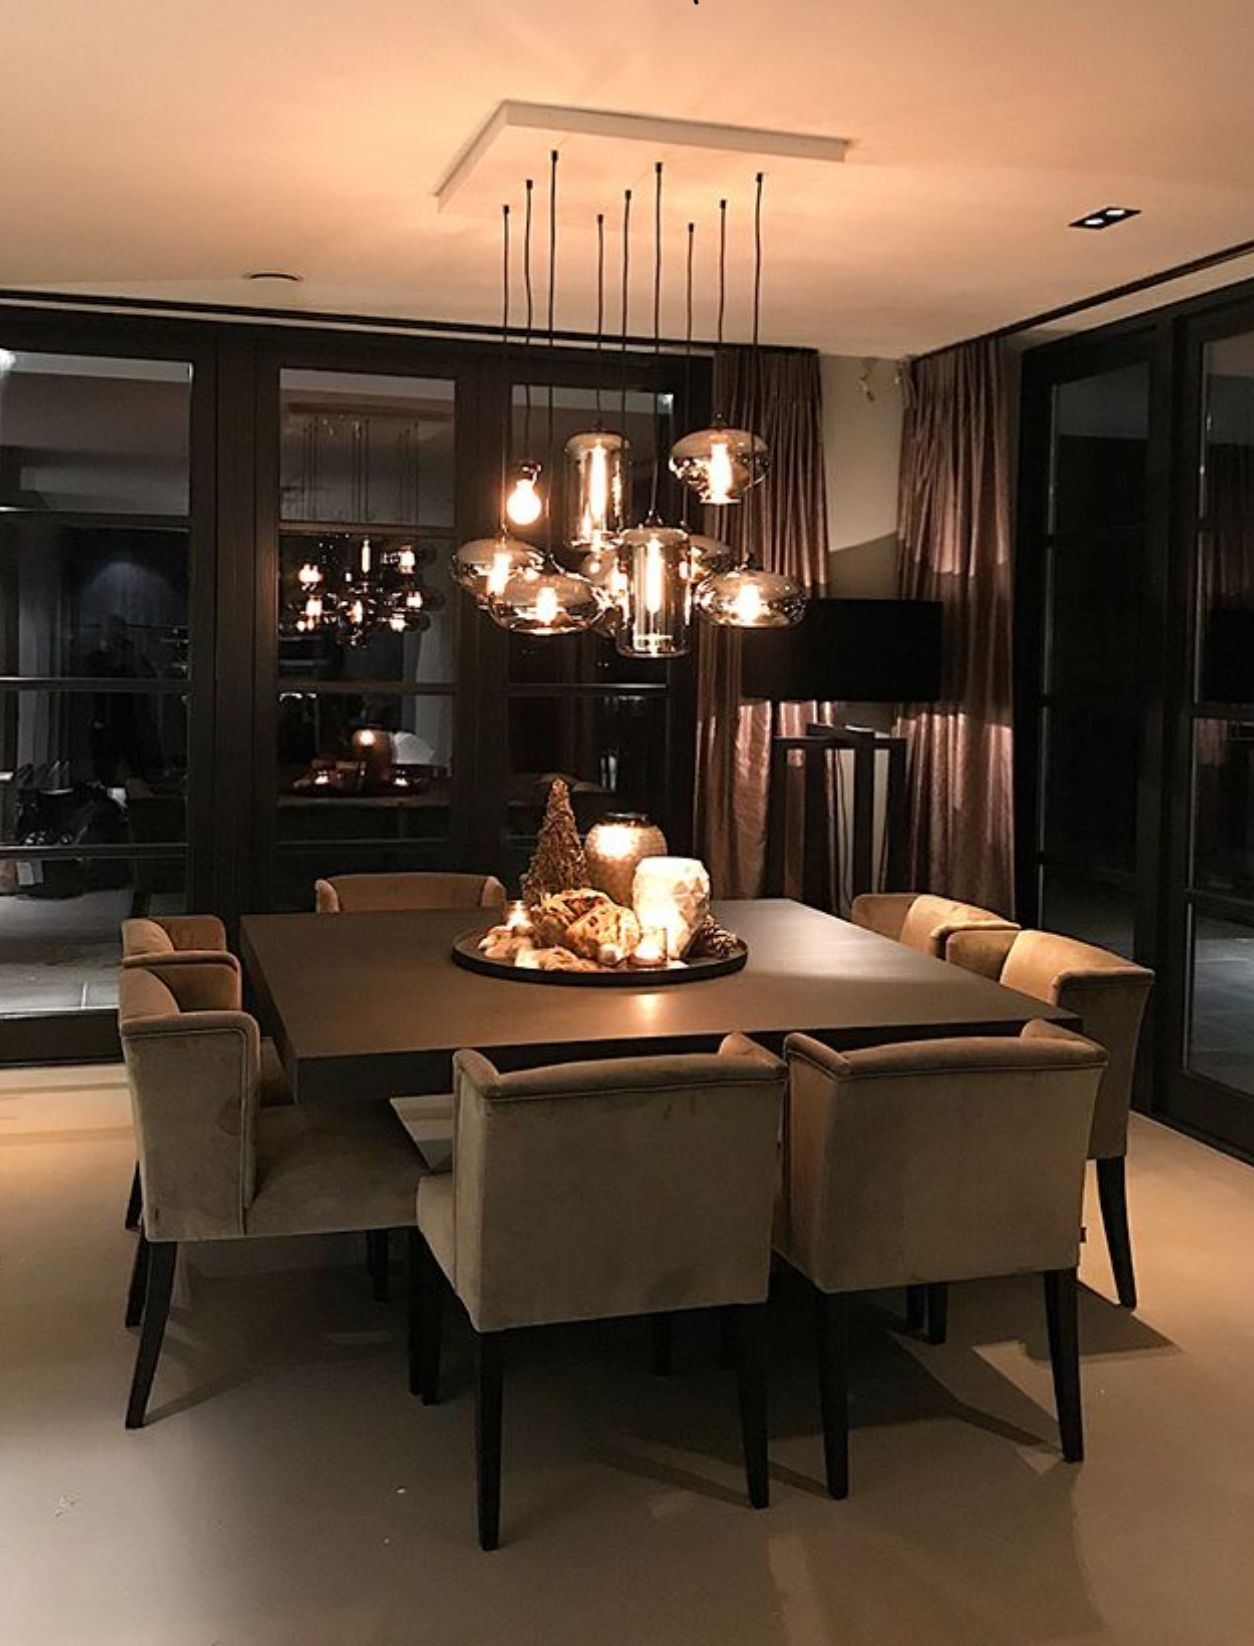 mooi project van sober sjiek dining room pinterest esszimmer wohnzimmer und haus. Black Bedroom Furniture Sets. Home Design Ideas